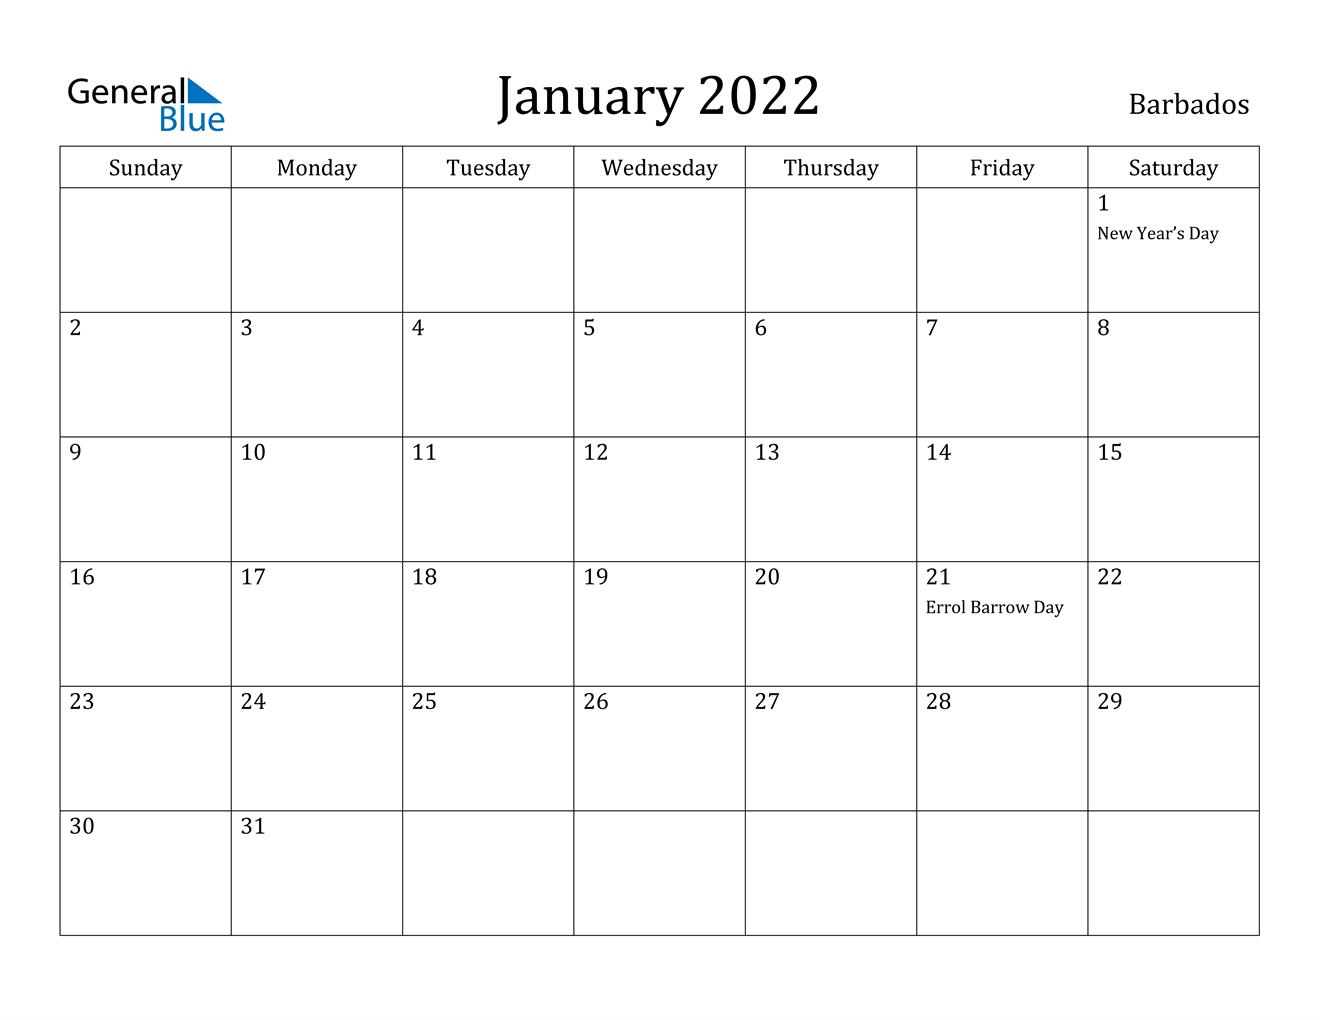 January 2022 Calendar - Barbados Regarding 2022 January Calendar With Holidays